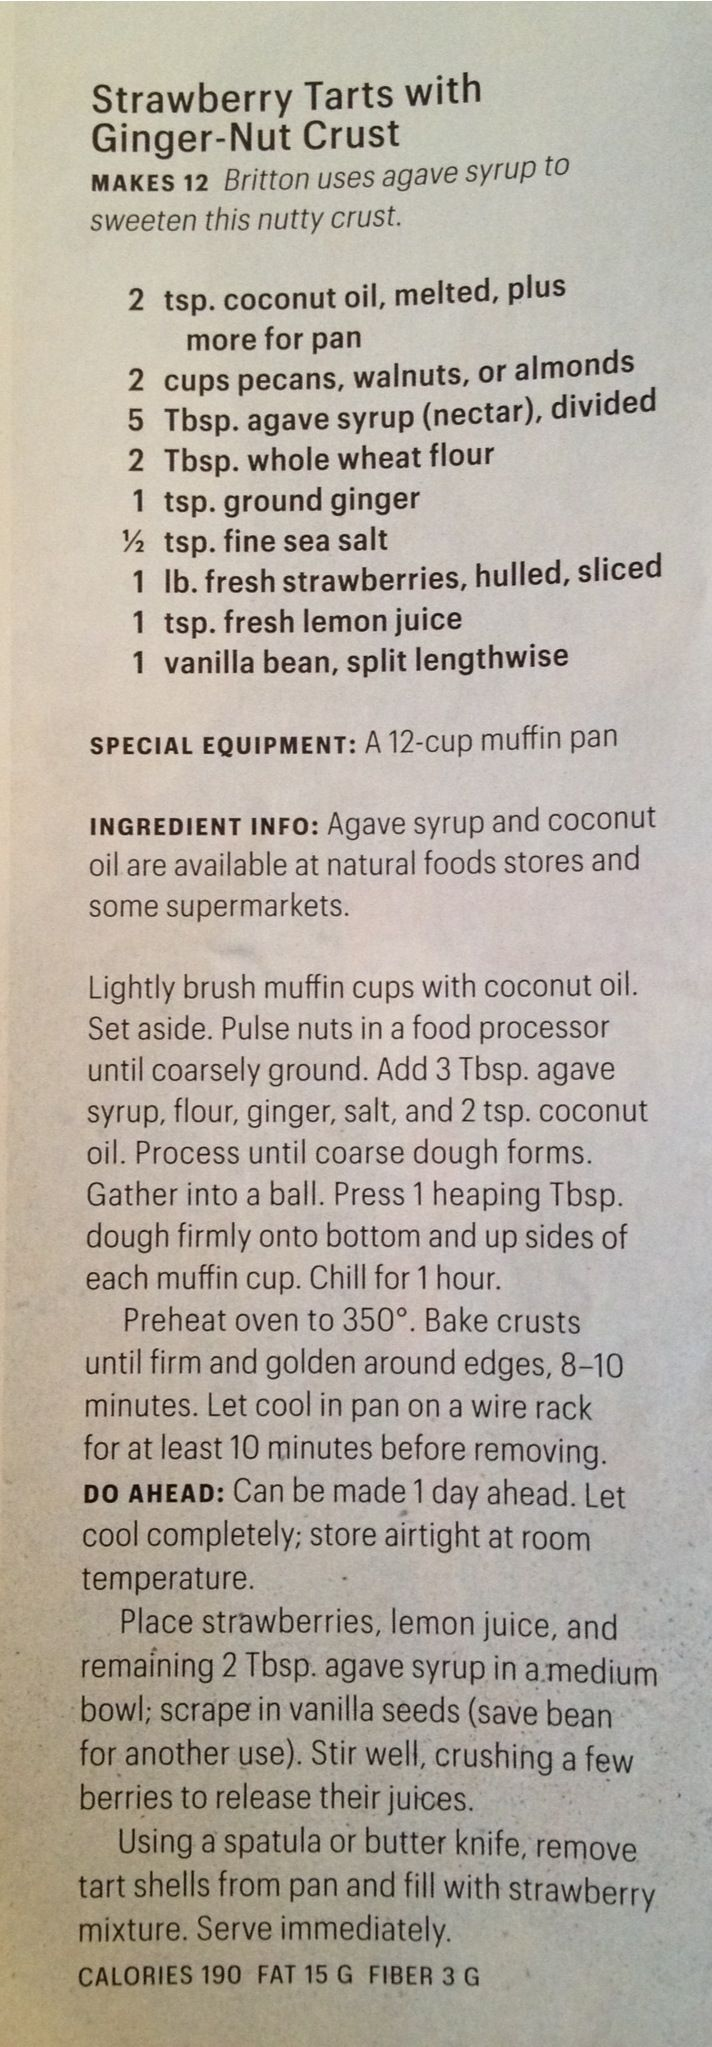 tarts with ginger-nut crust | Desserts | Pinterest | Strawberry Tarts ...